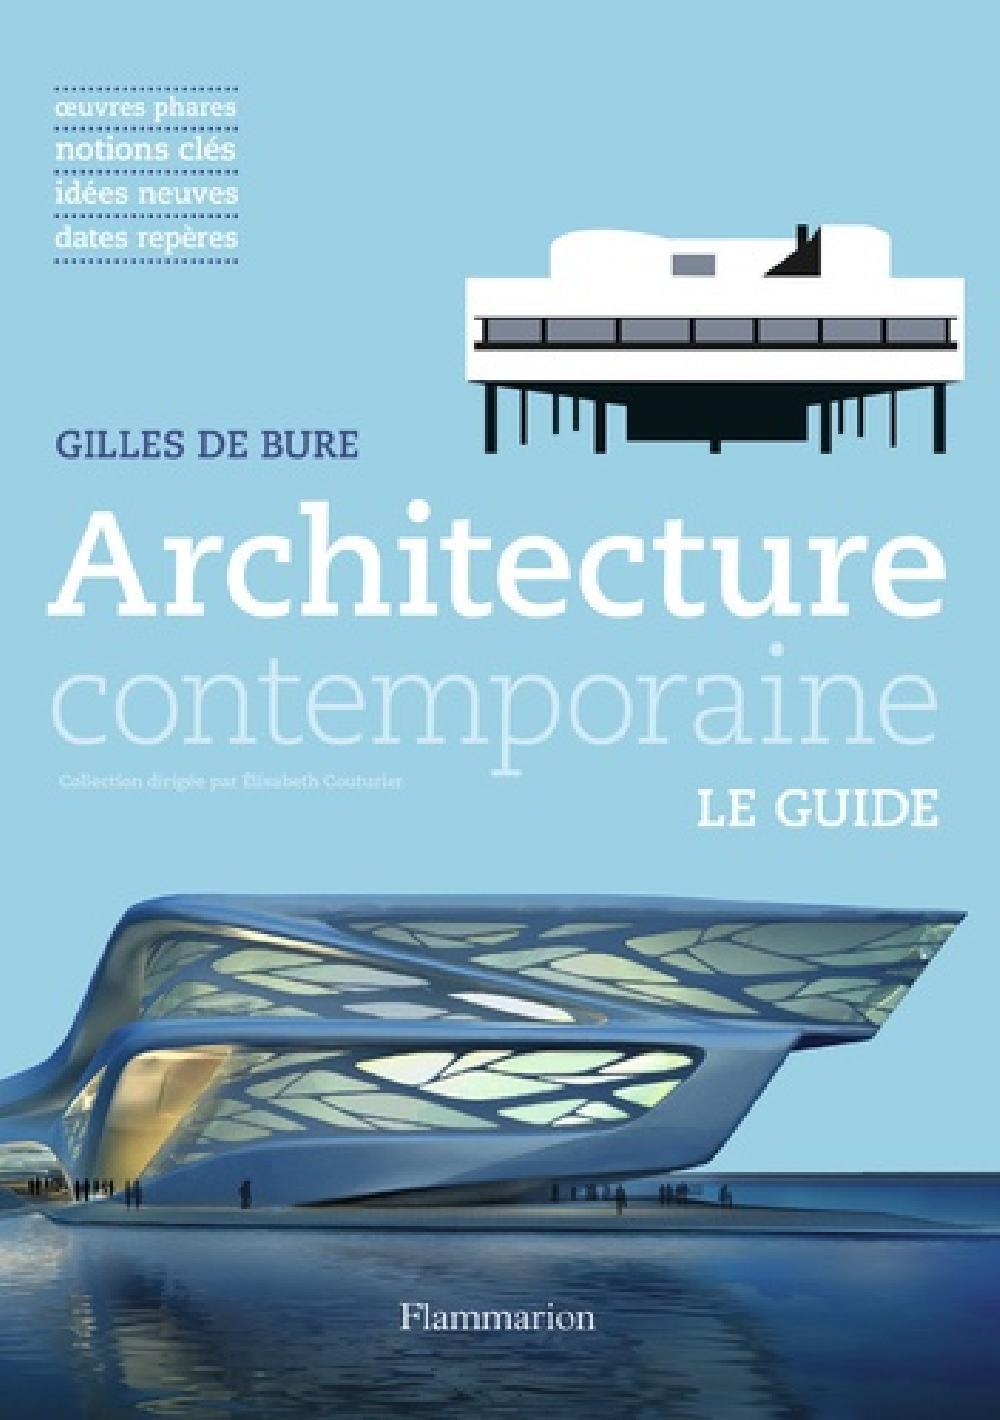 Architecture contemporaine mode d'emploi